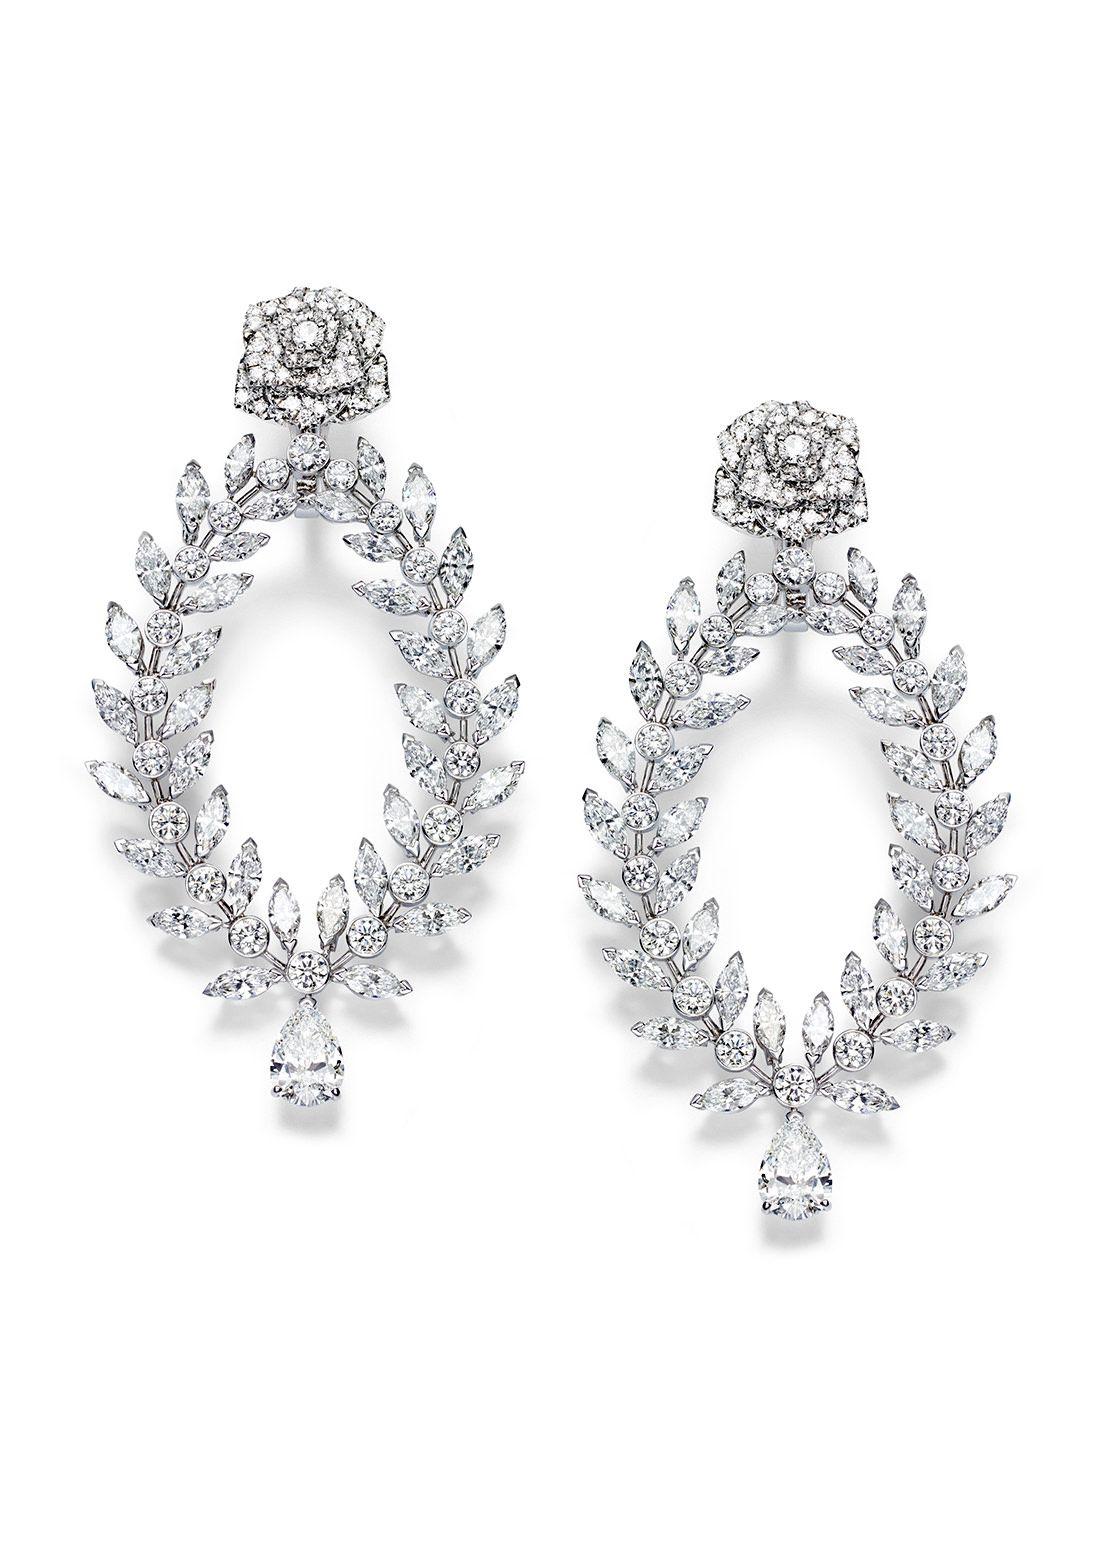 piagetcollectionrose20 Piaget jewelry, Jewelry, Diamond